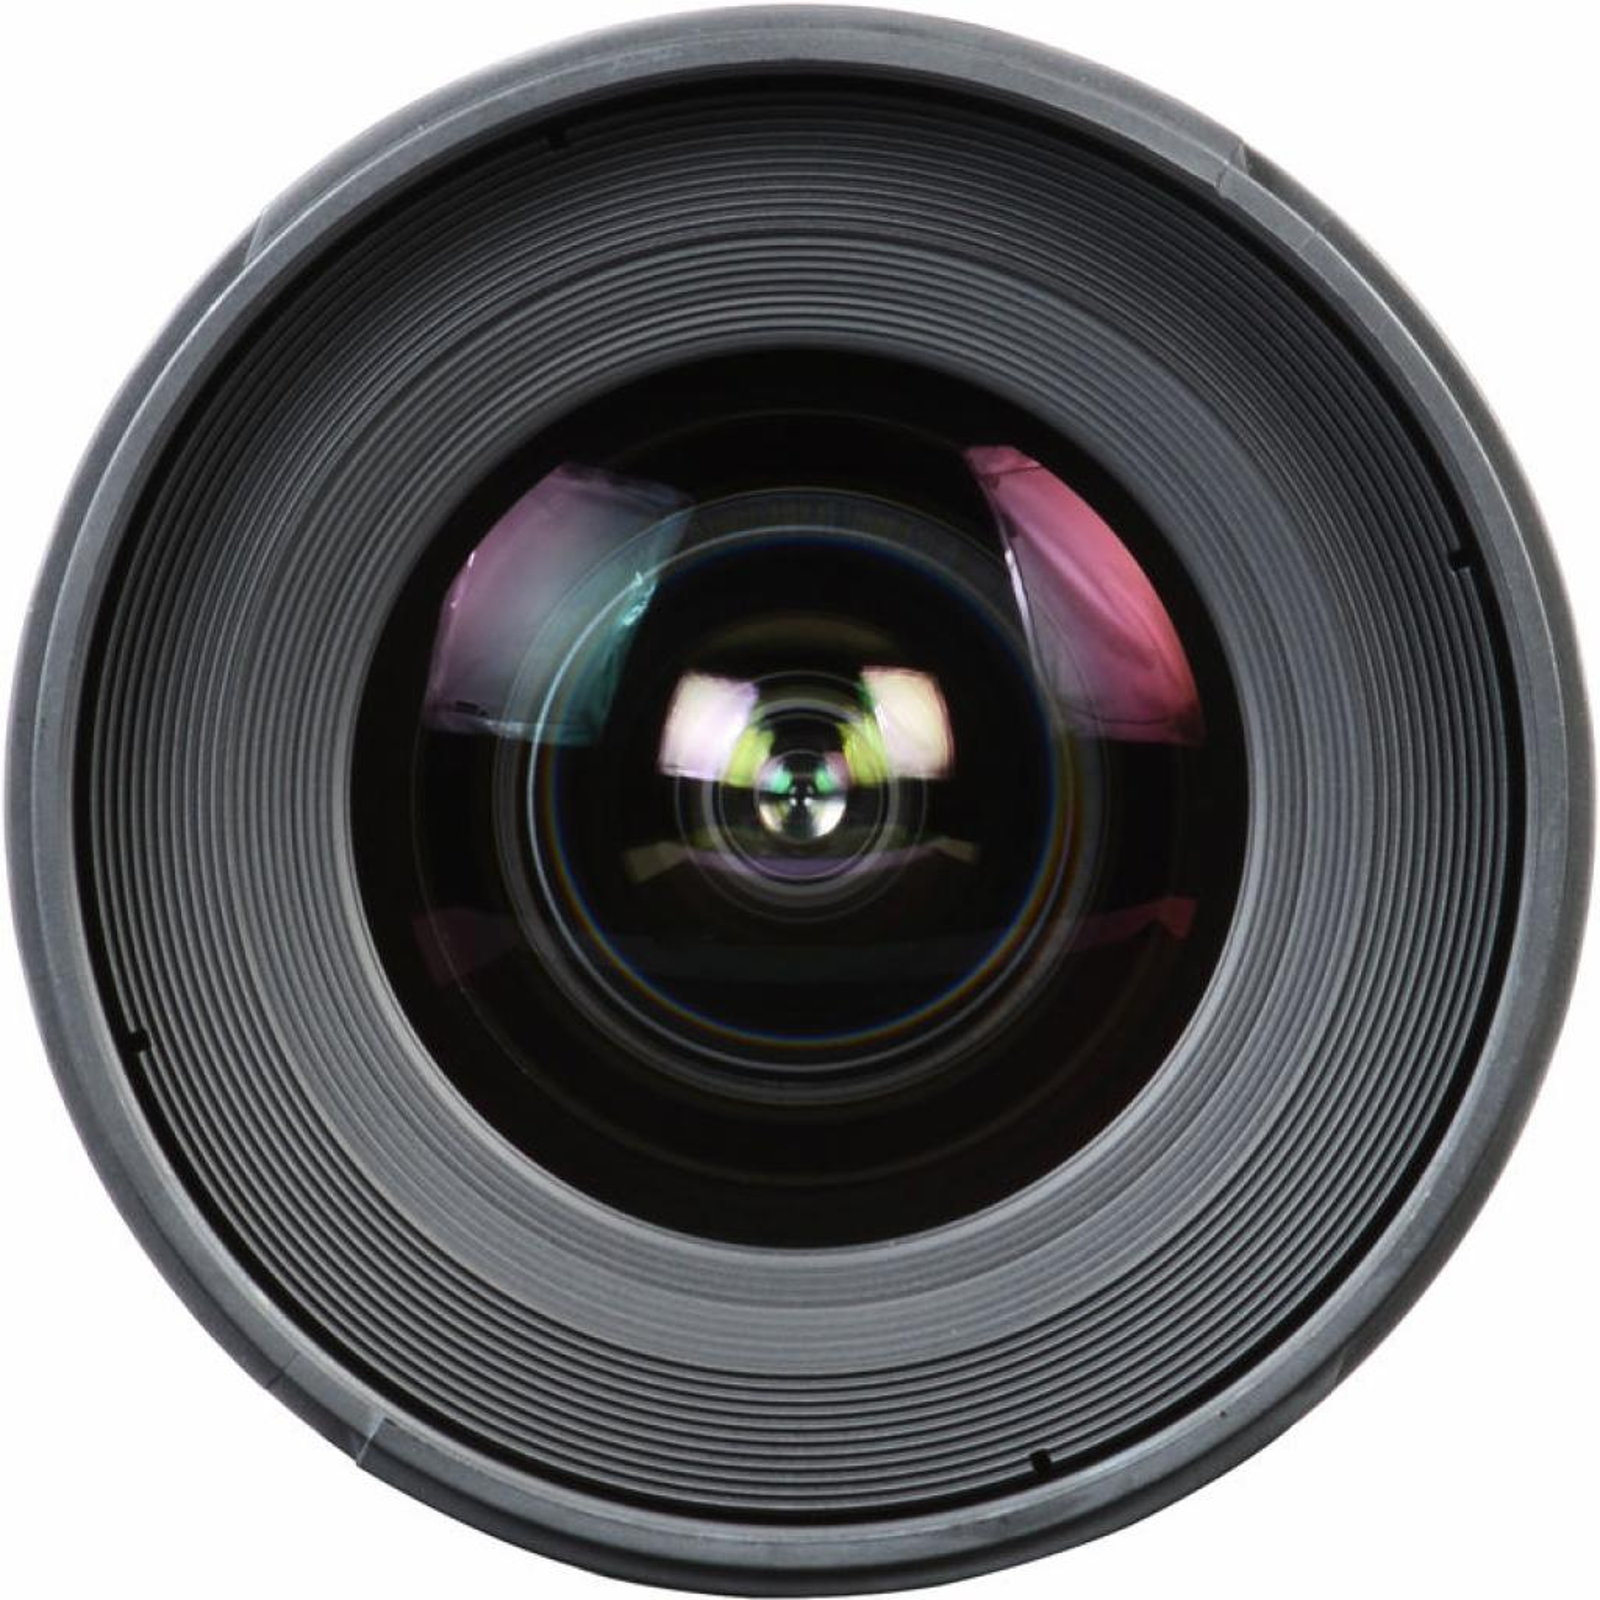 Объектив Tokina AT-X PRO DX 11-20mm f/2.8 (Canon) (ATXAF120DXC) изображение 5